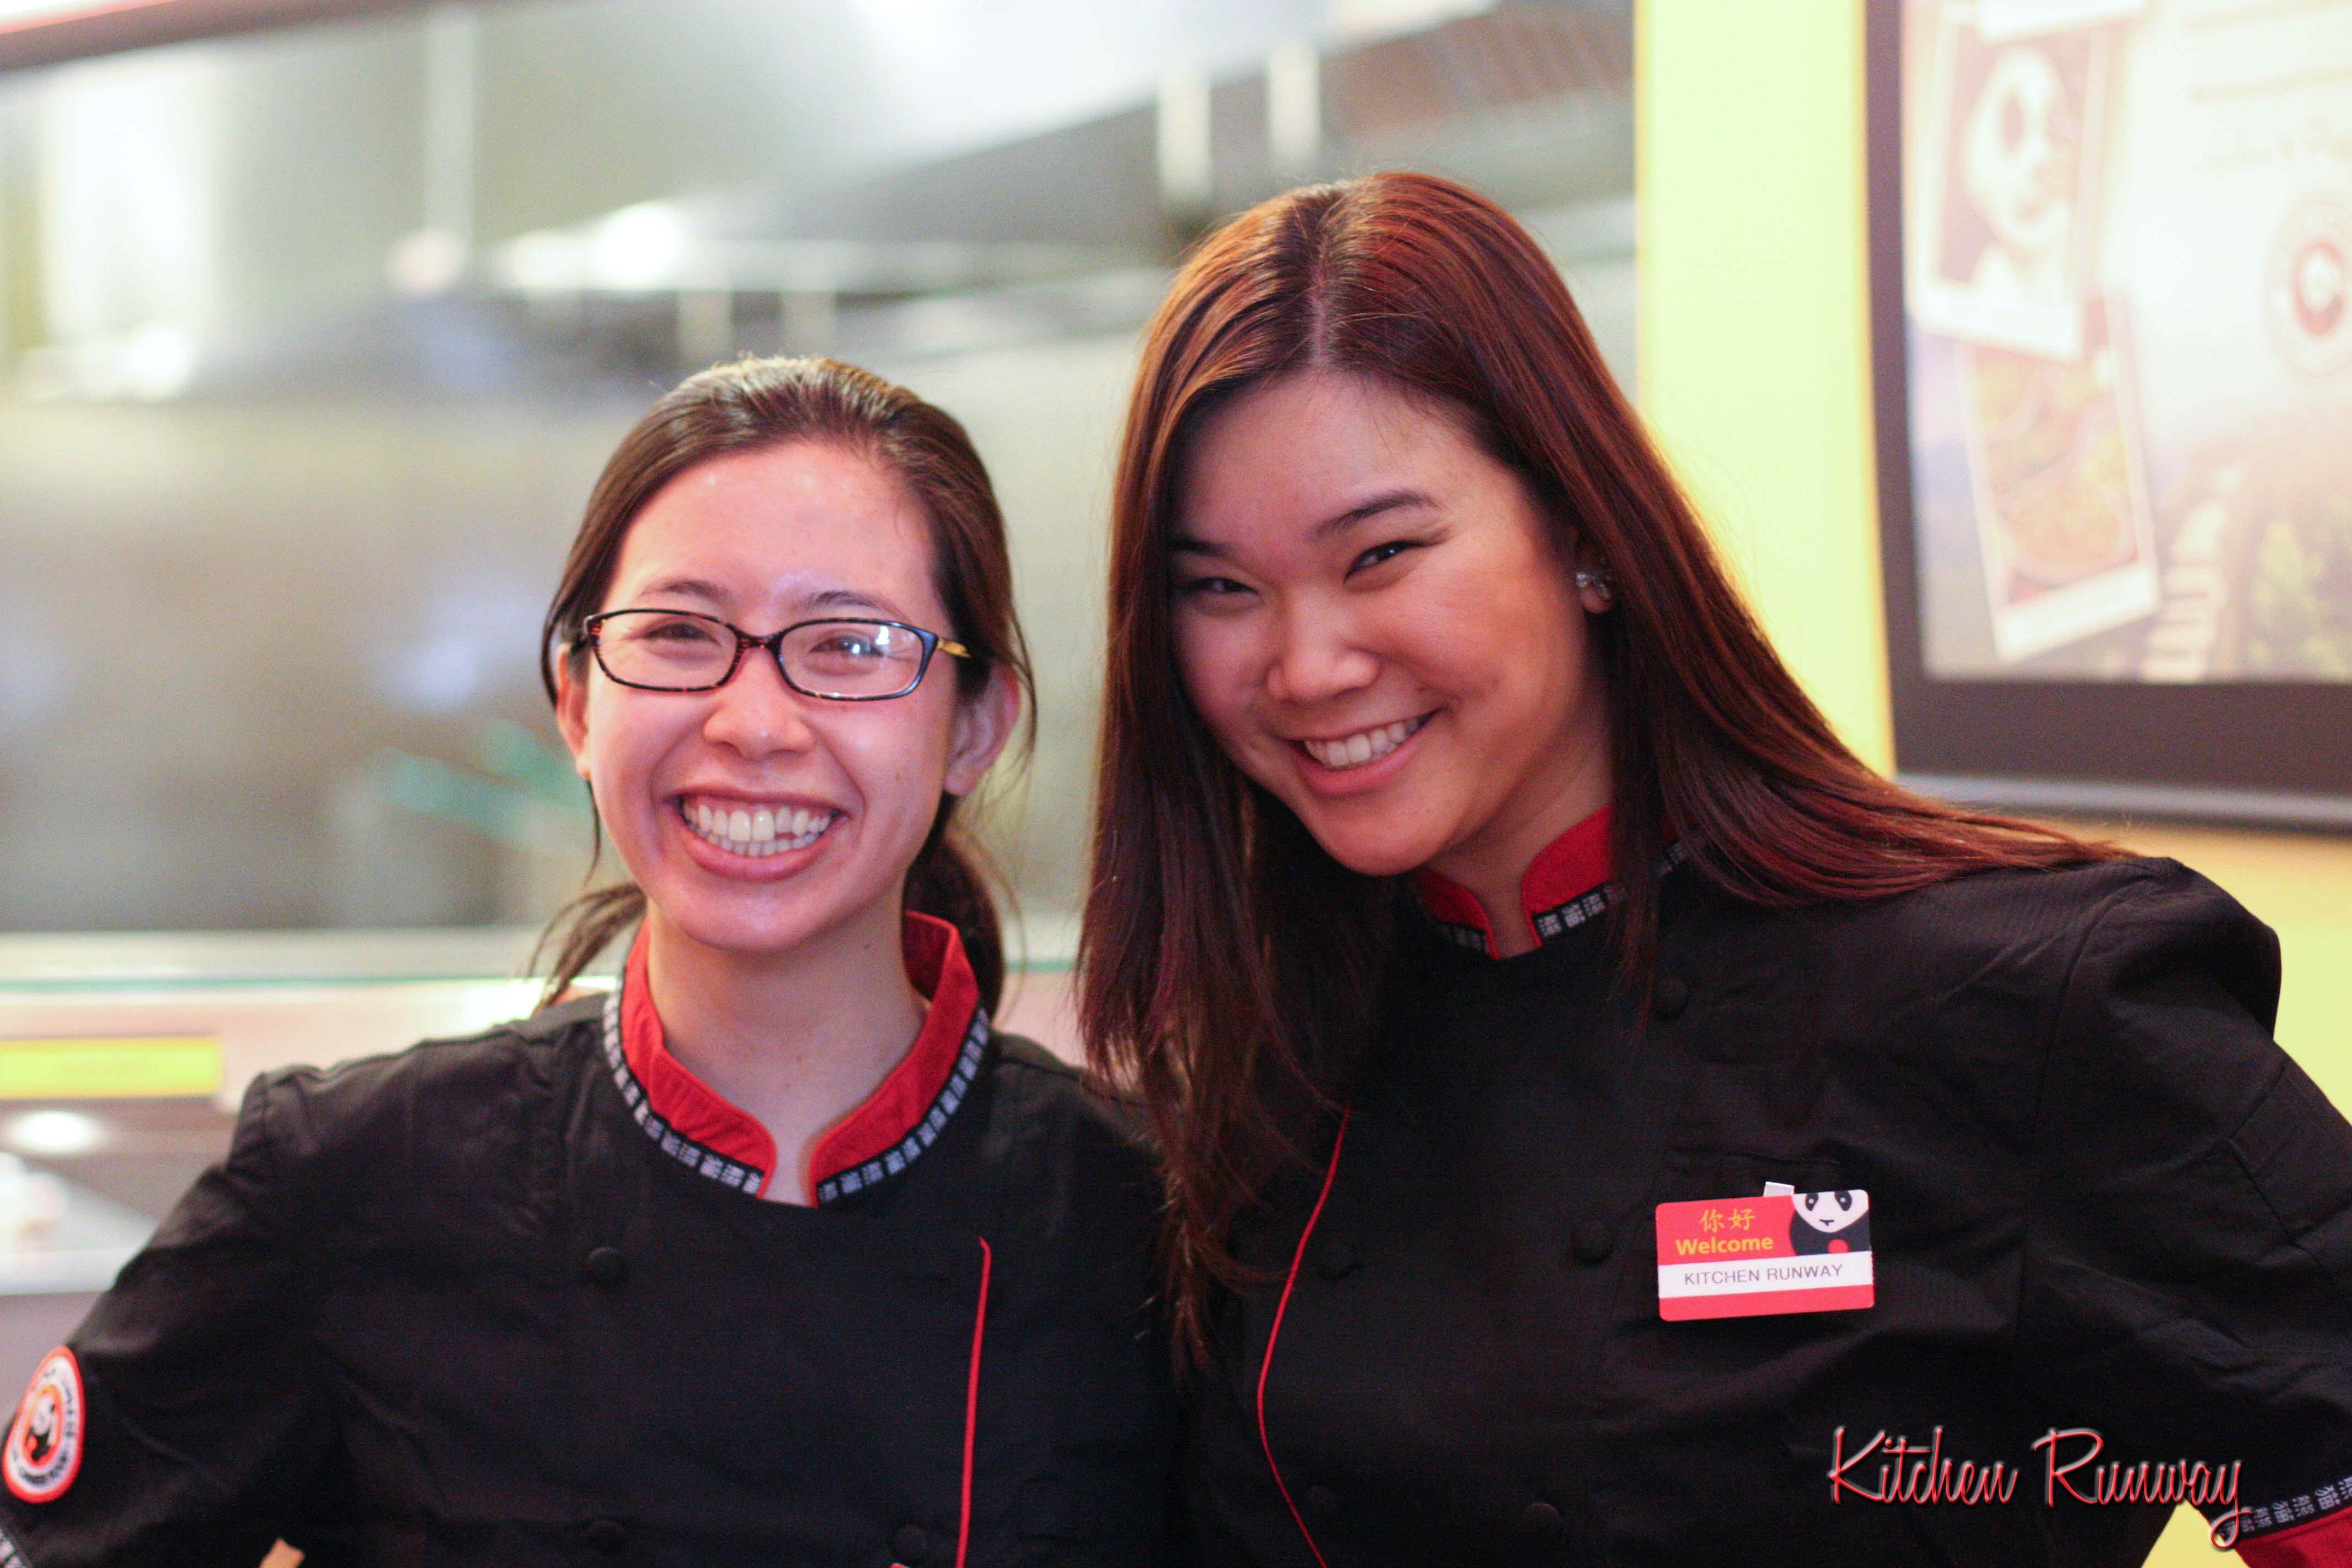 cathy and quyen - panda express wok star challenge